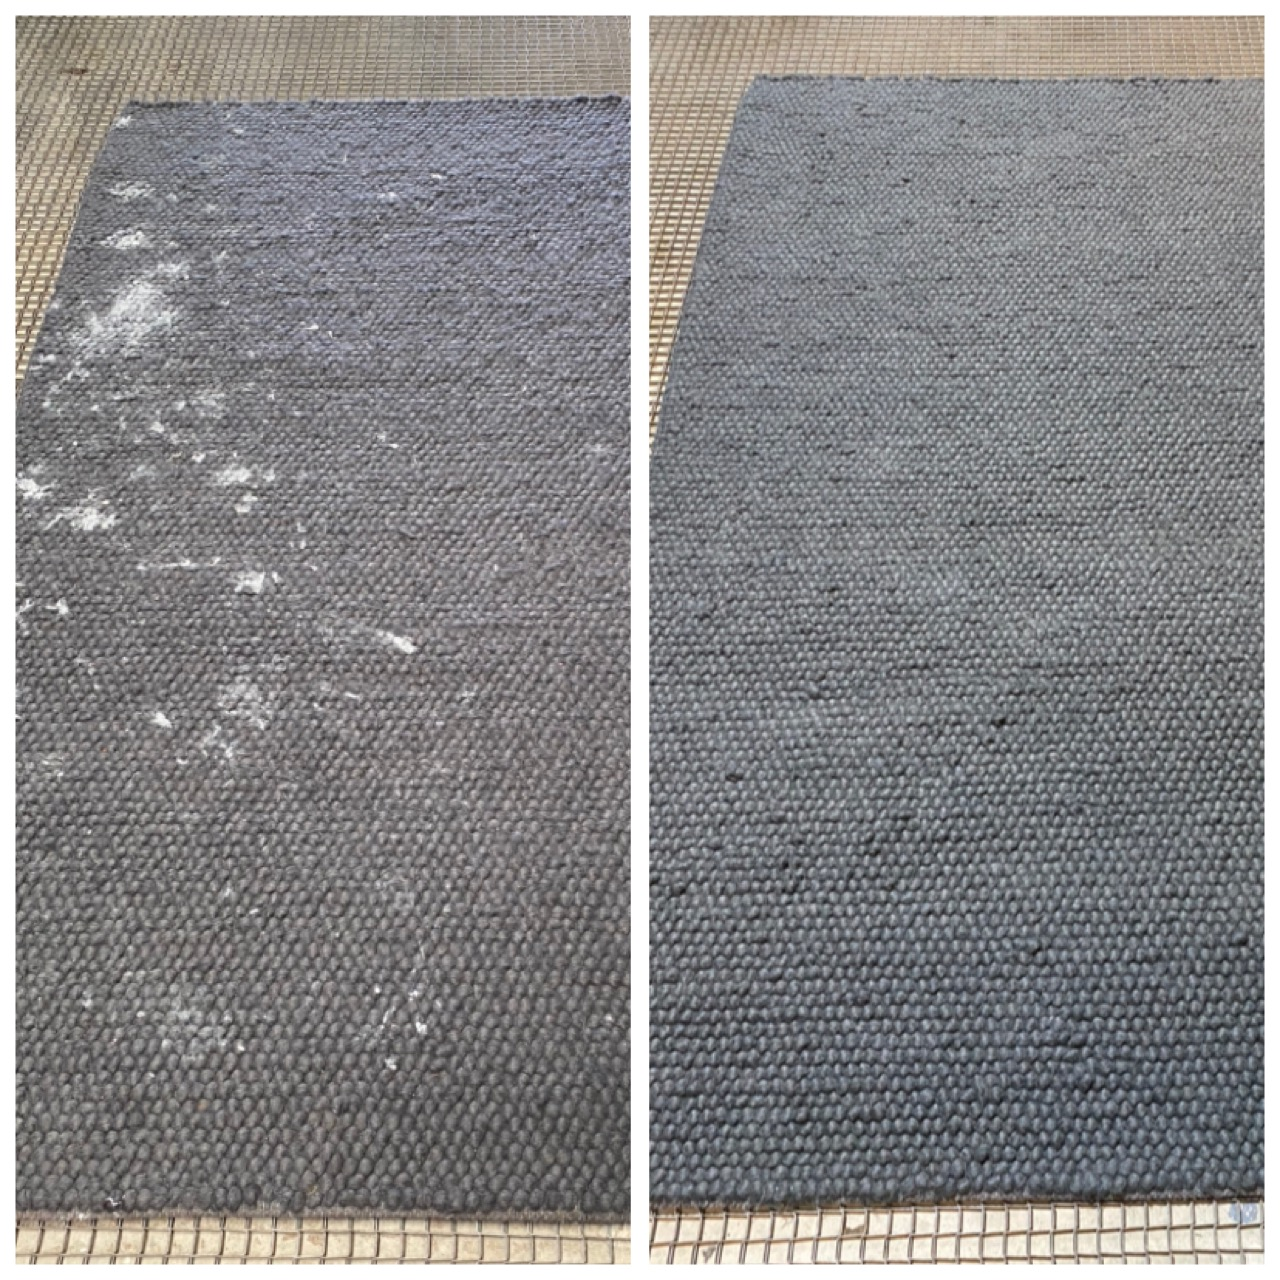 Northwich rug cleaner